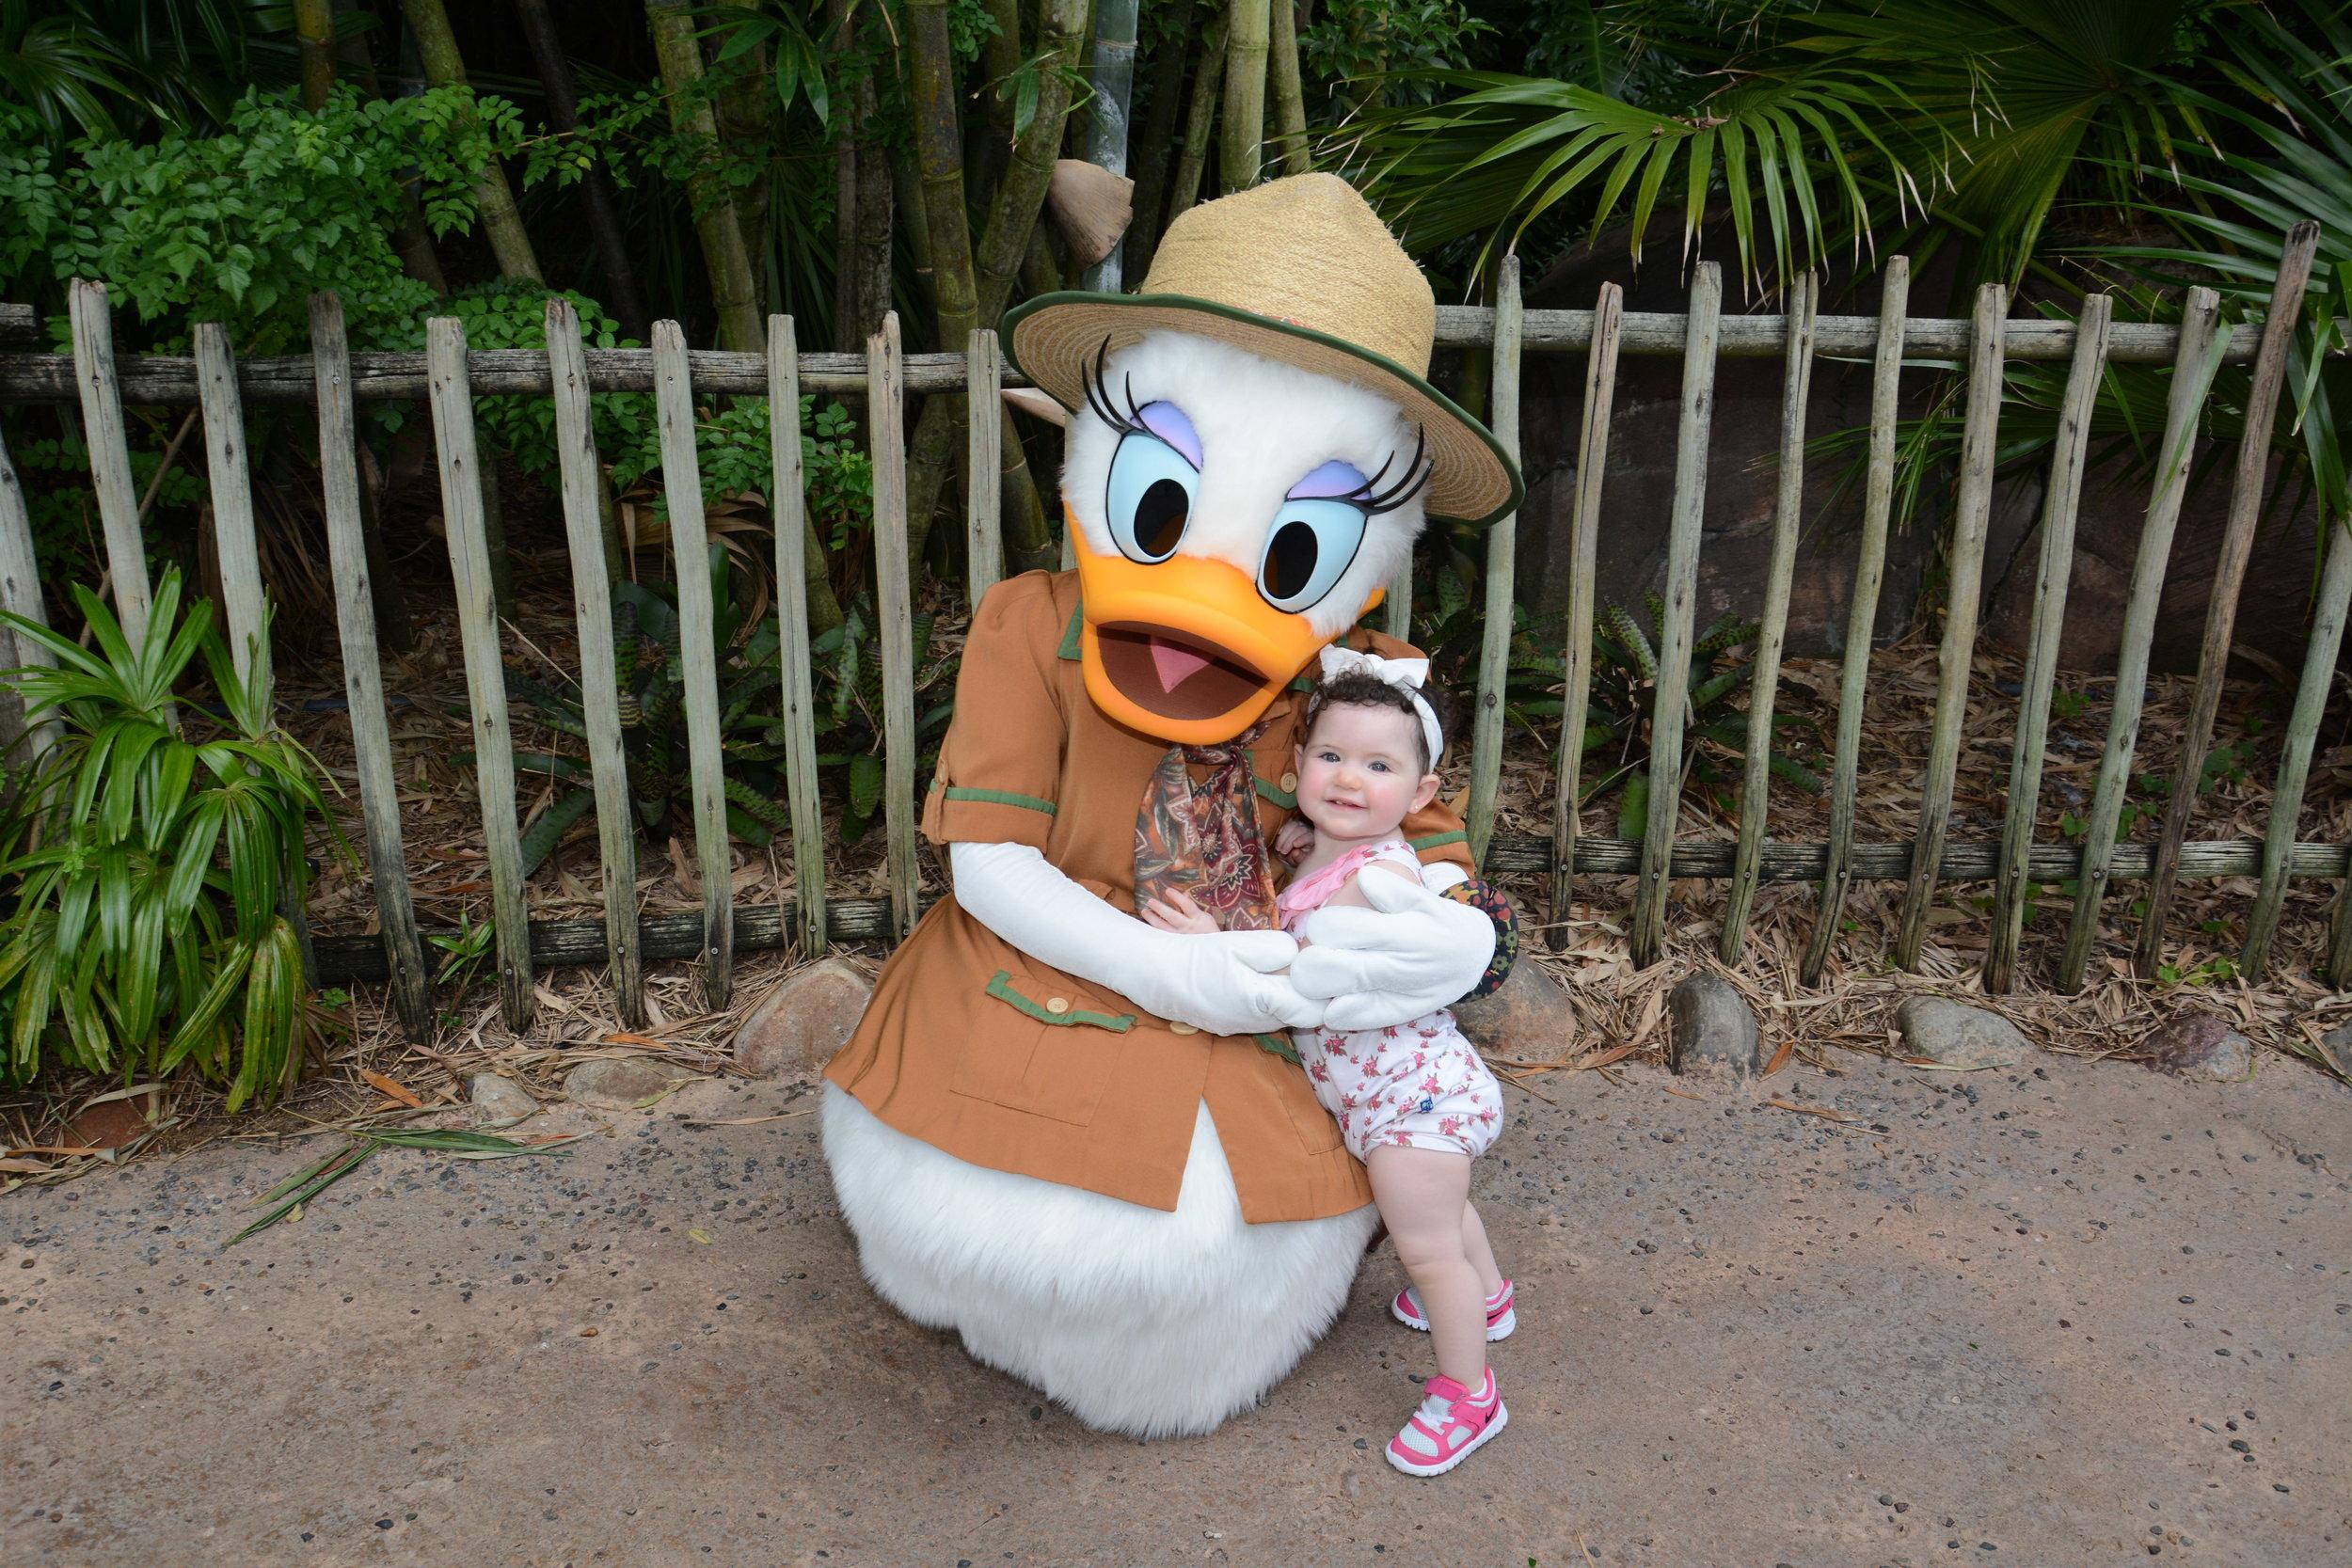 PhotoPass_Visiting_Disneys_Animal_Kingdom_Park_7456249414.jpg